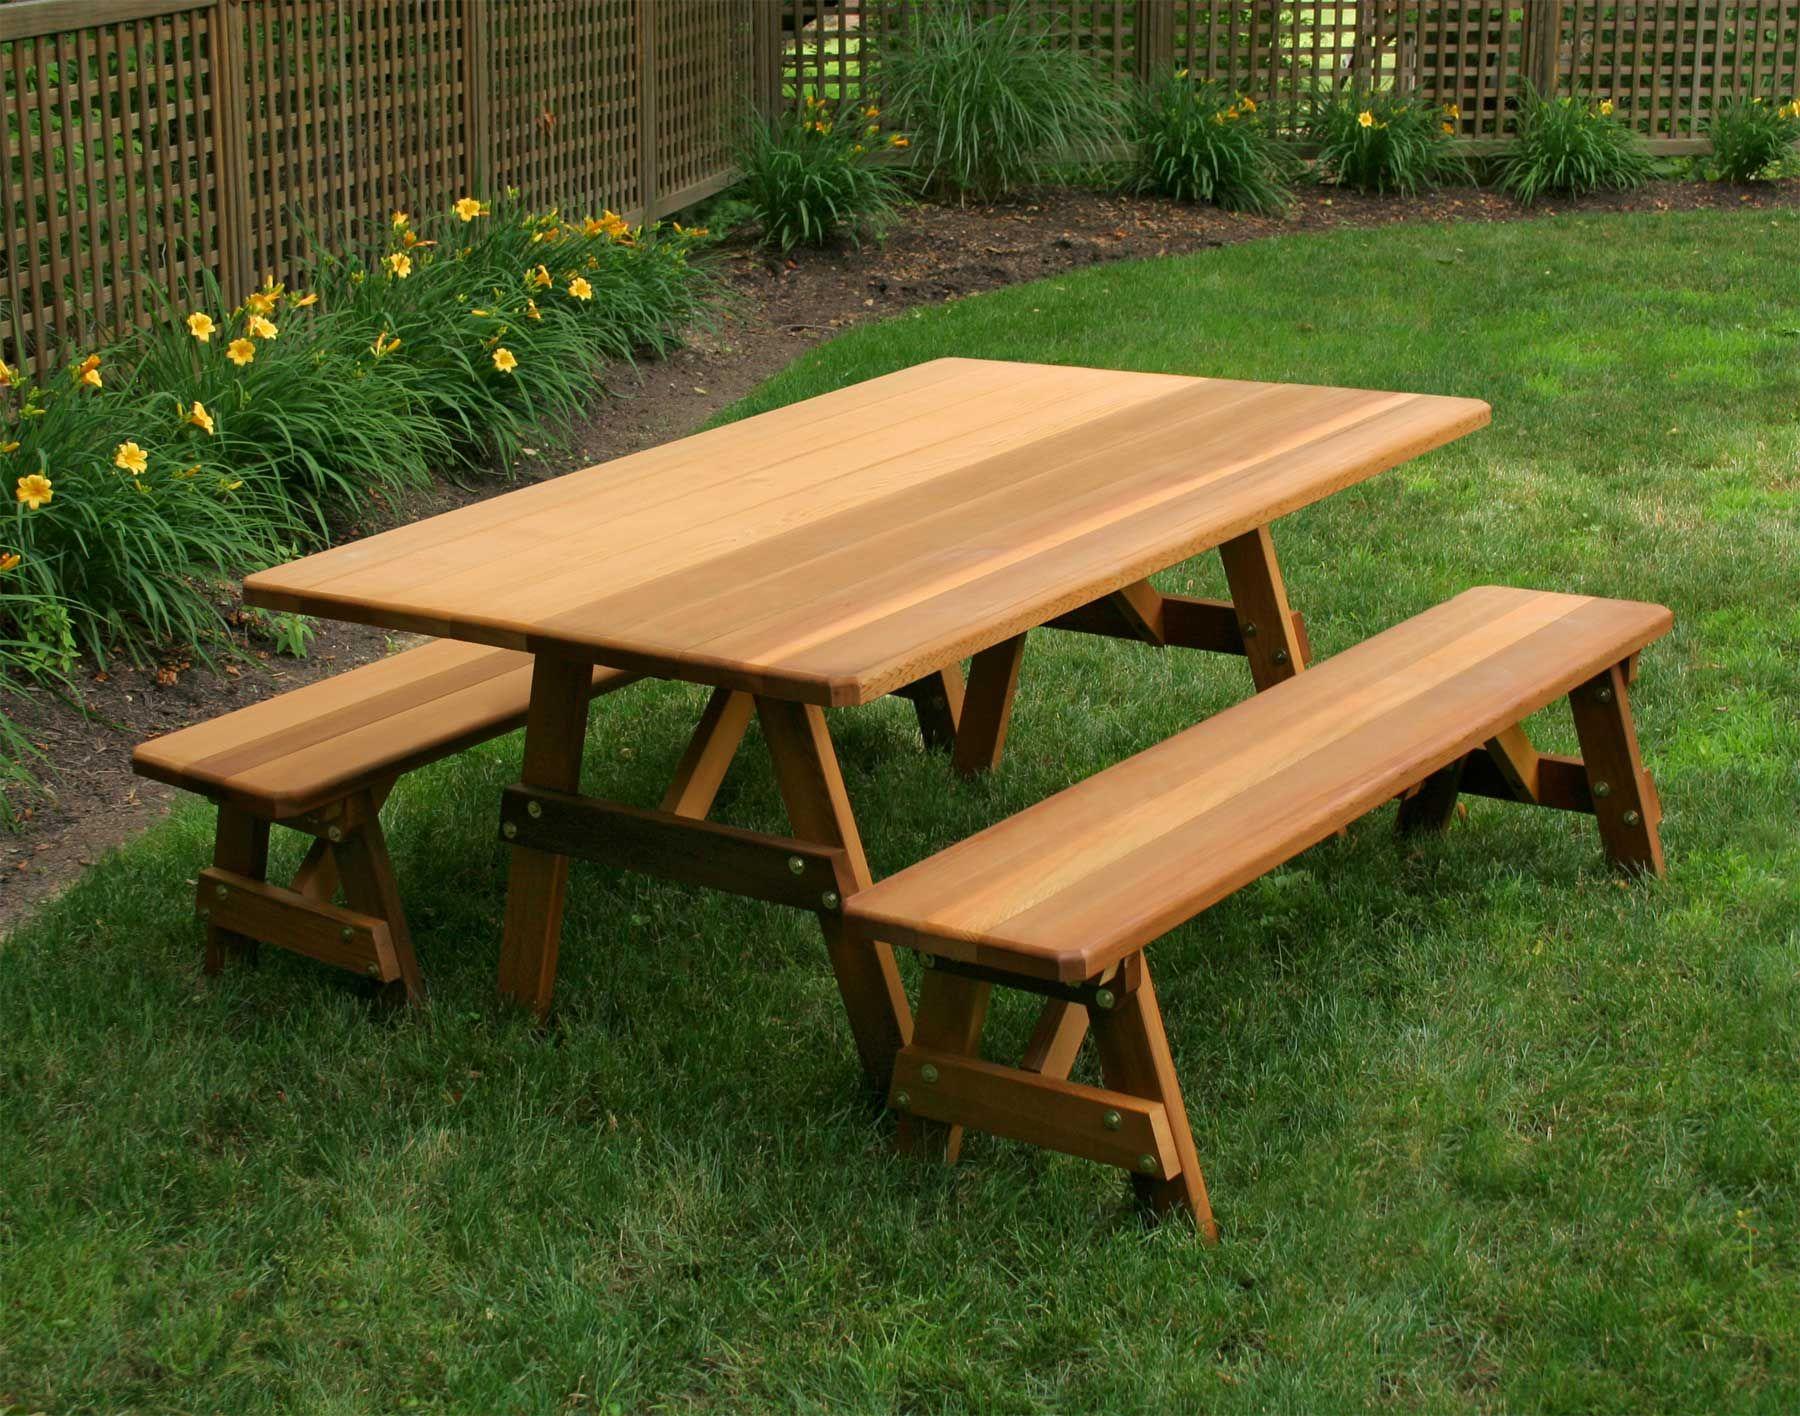 Cool 42 Wide Red Cedar Traditional Picnic Table W Benches 42W Creativecarmelina Interior Chair Design Creativecarmelinacom